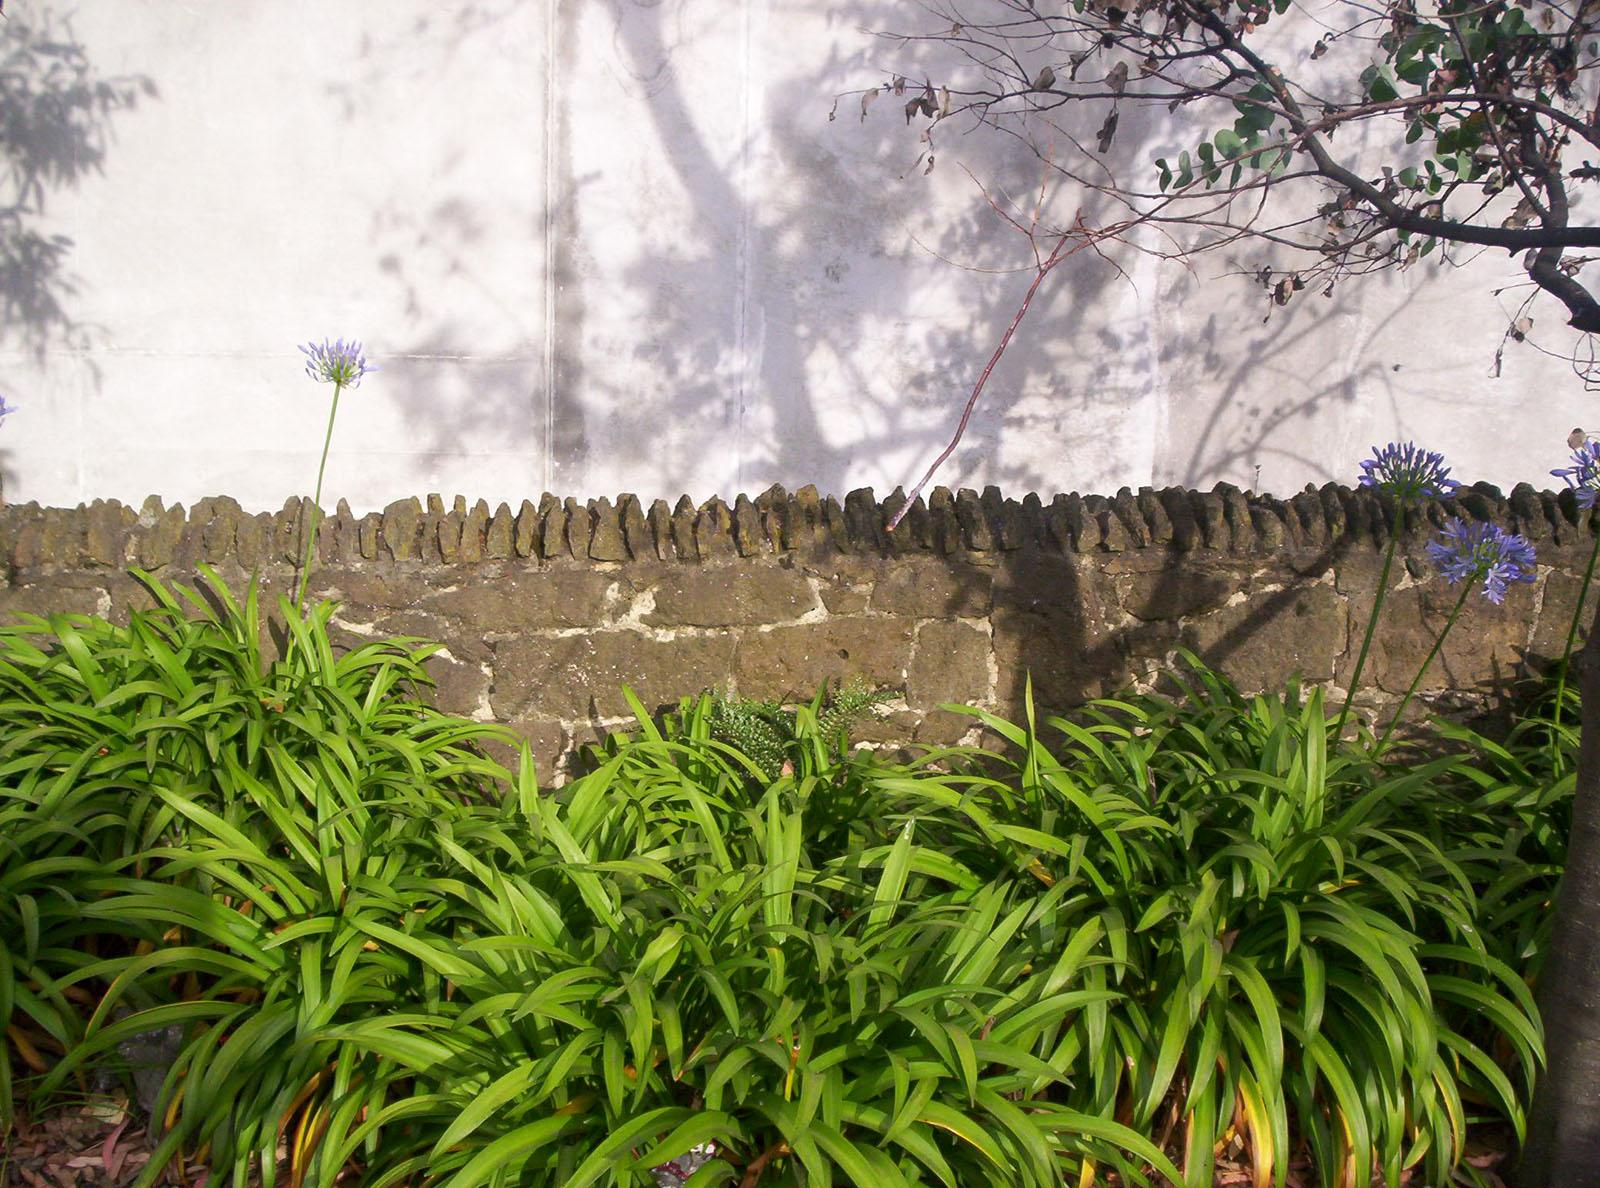 Stone Wall, Agapanthus, Bspo06, Concrete, Dunedin, HQ Photo